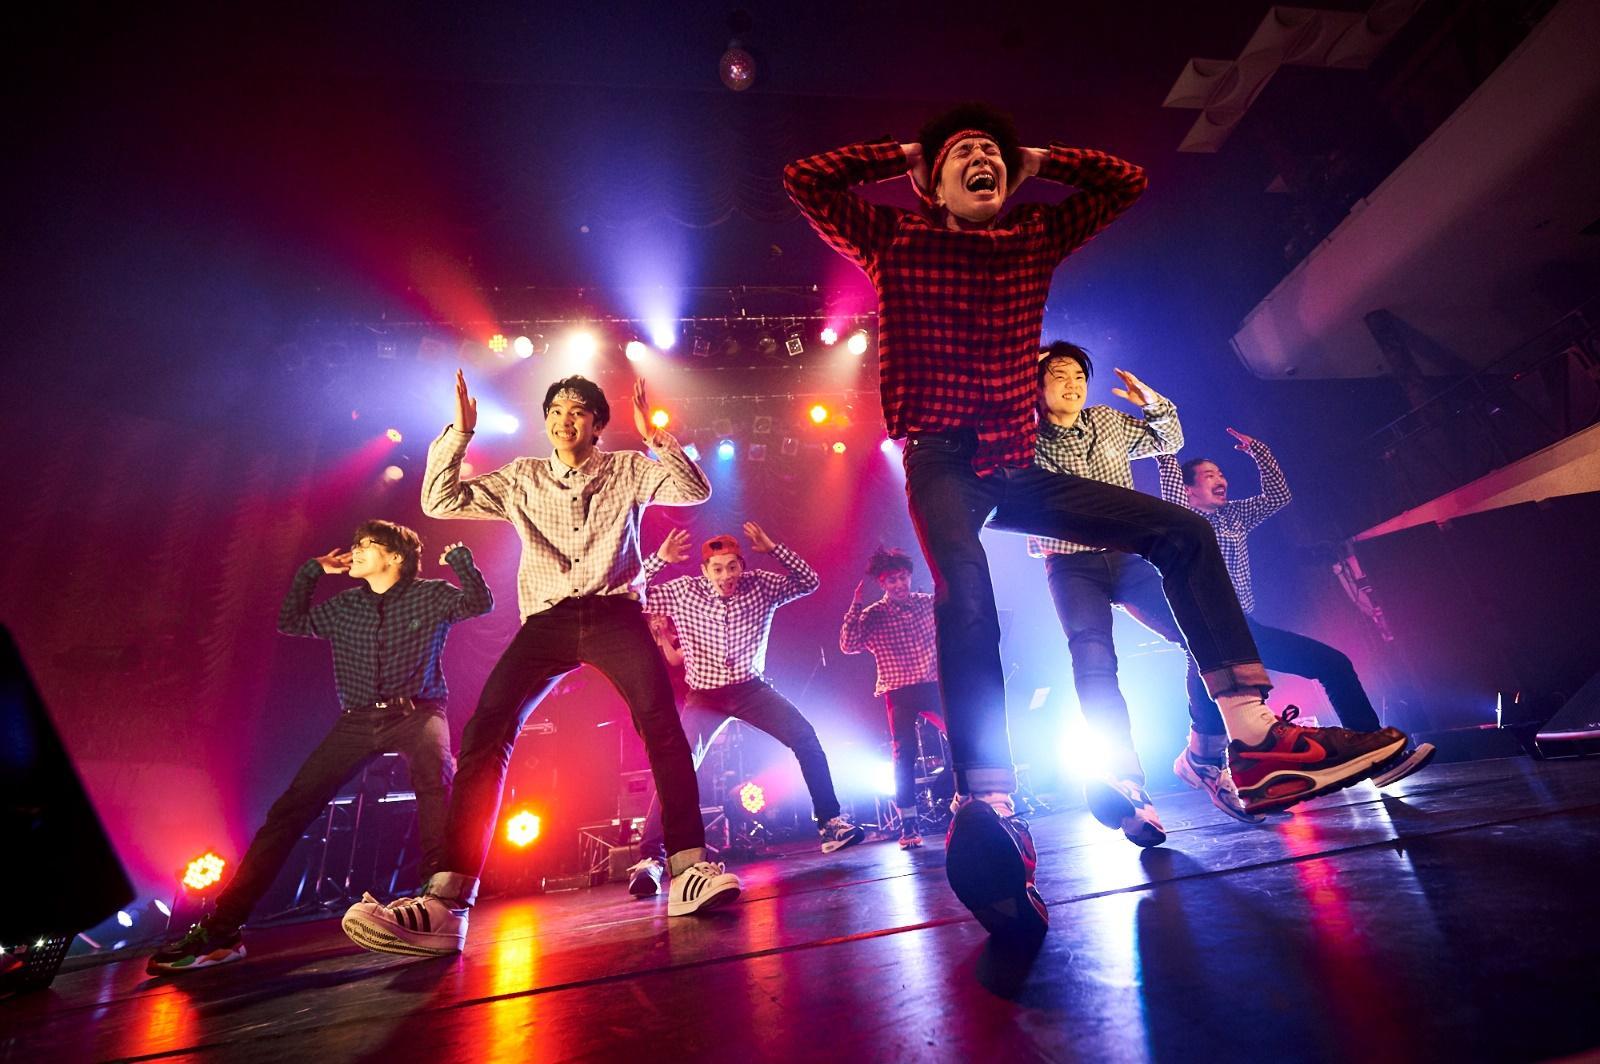 「RAB」ワンマンライブ 『-SUPER FRESH BAND LIVE-』有観客&オンライン配信。 RAB史上初バンド×ダンスライブで重大十大発表を公開!